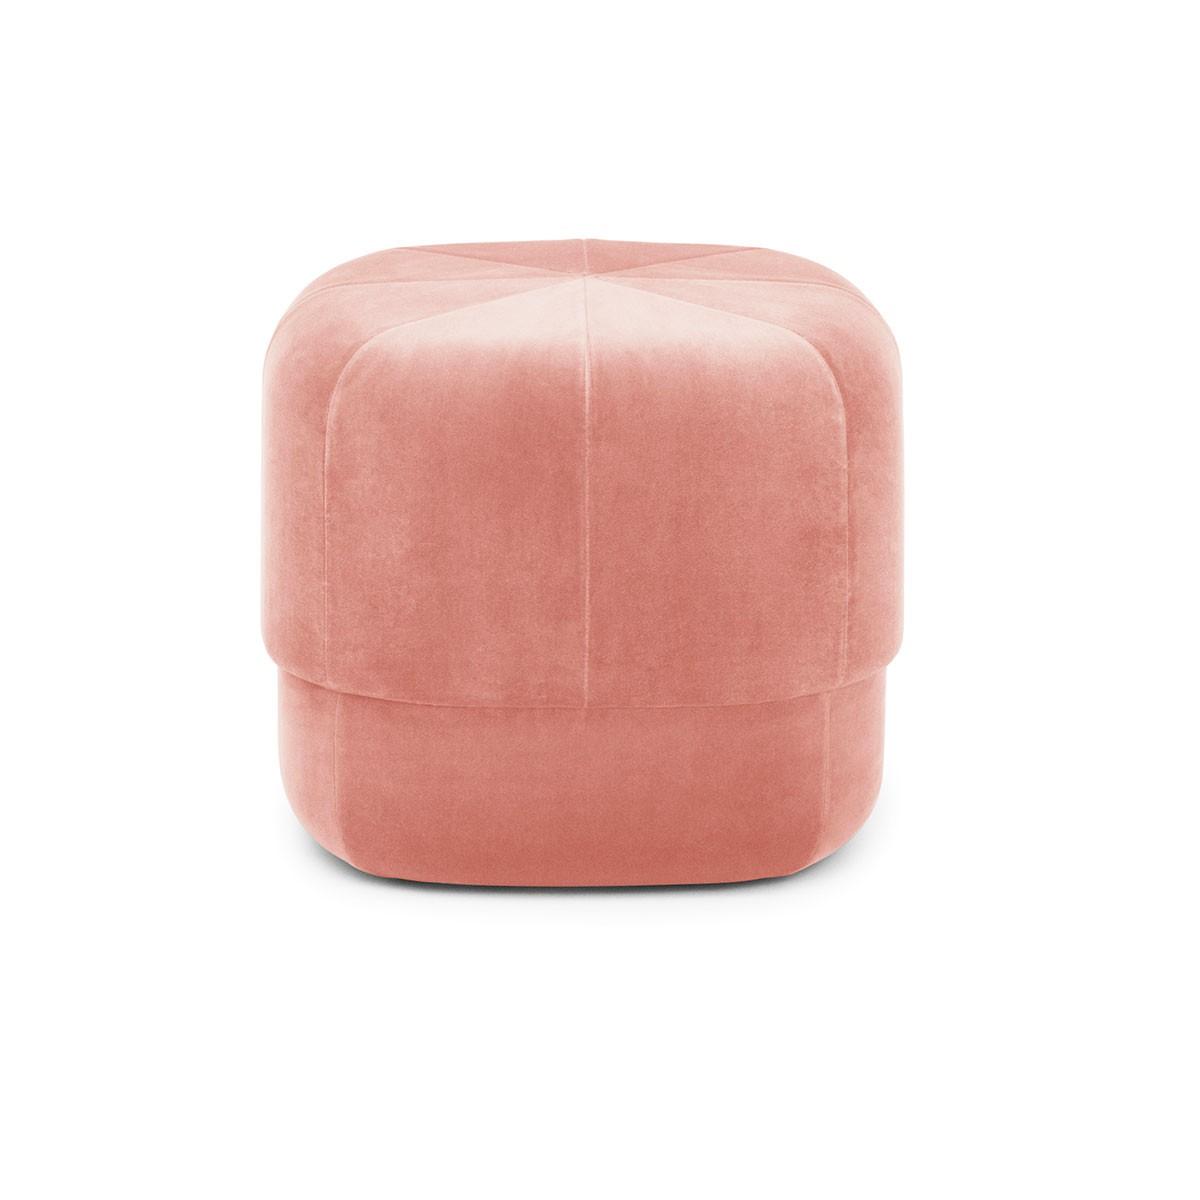 pouf-circus-velours-small-normann-copenhagen-rose-blush